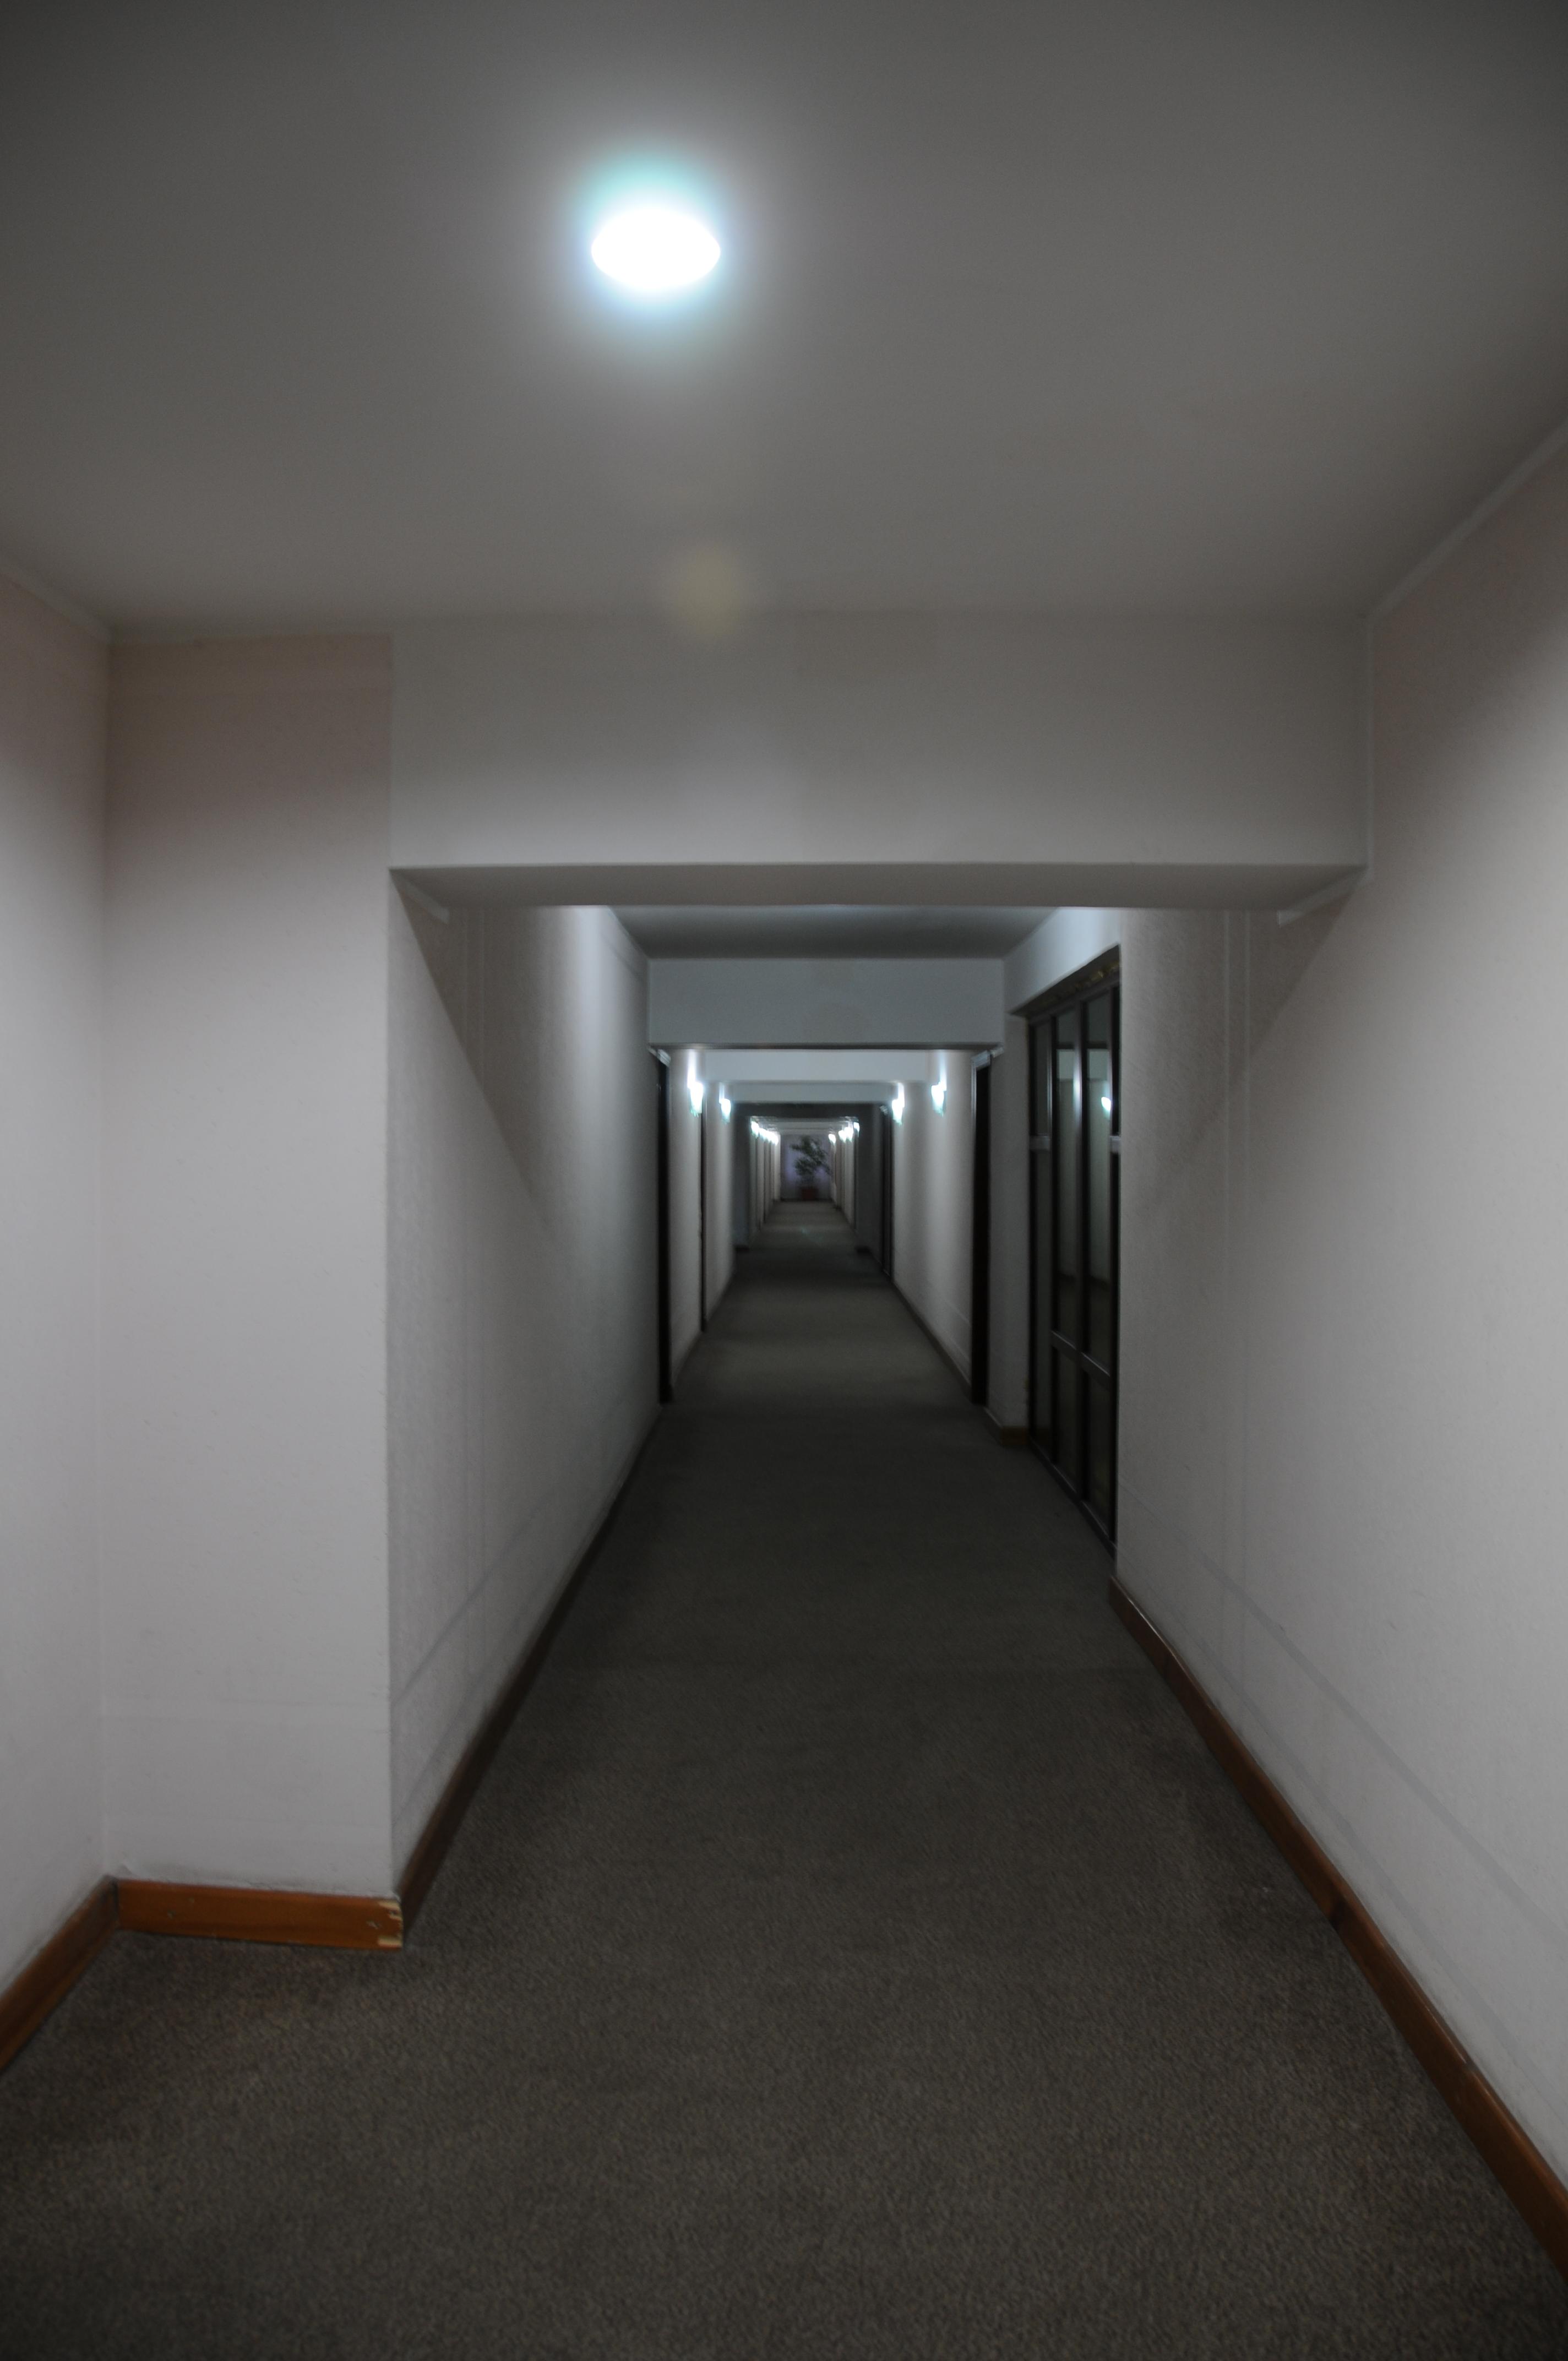 Hotel o cárcel?